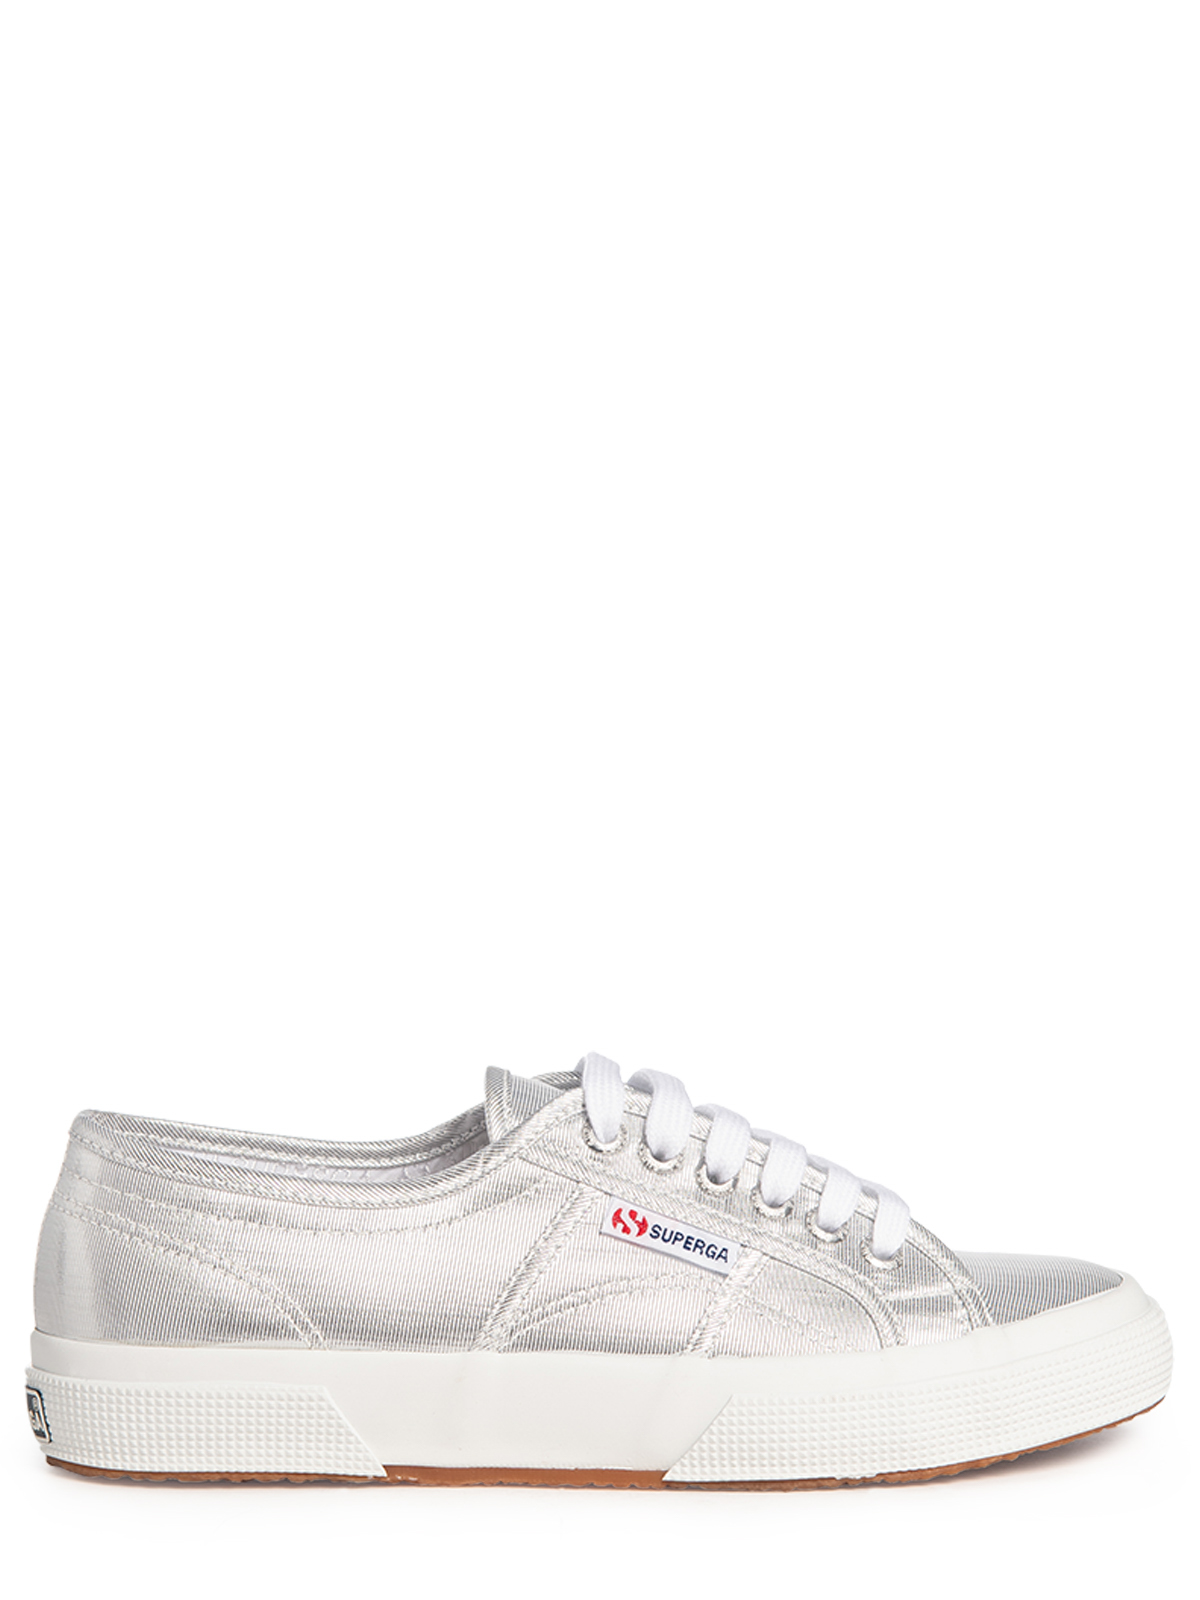 Superga Sneaker Microlamew grau silber